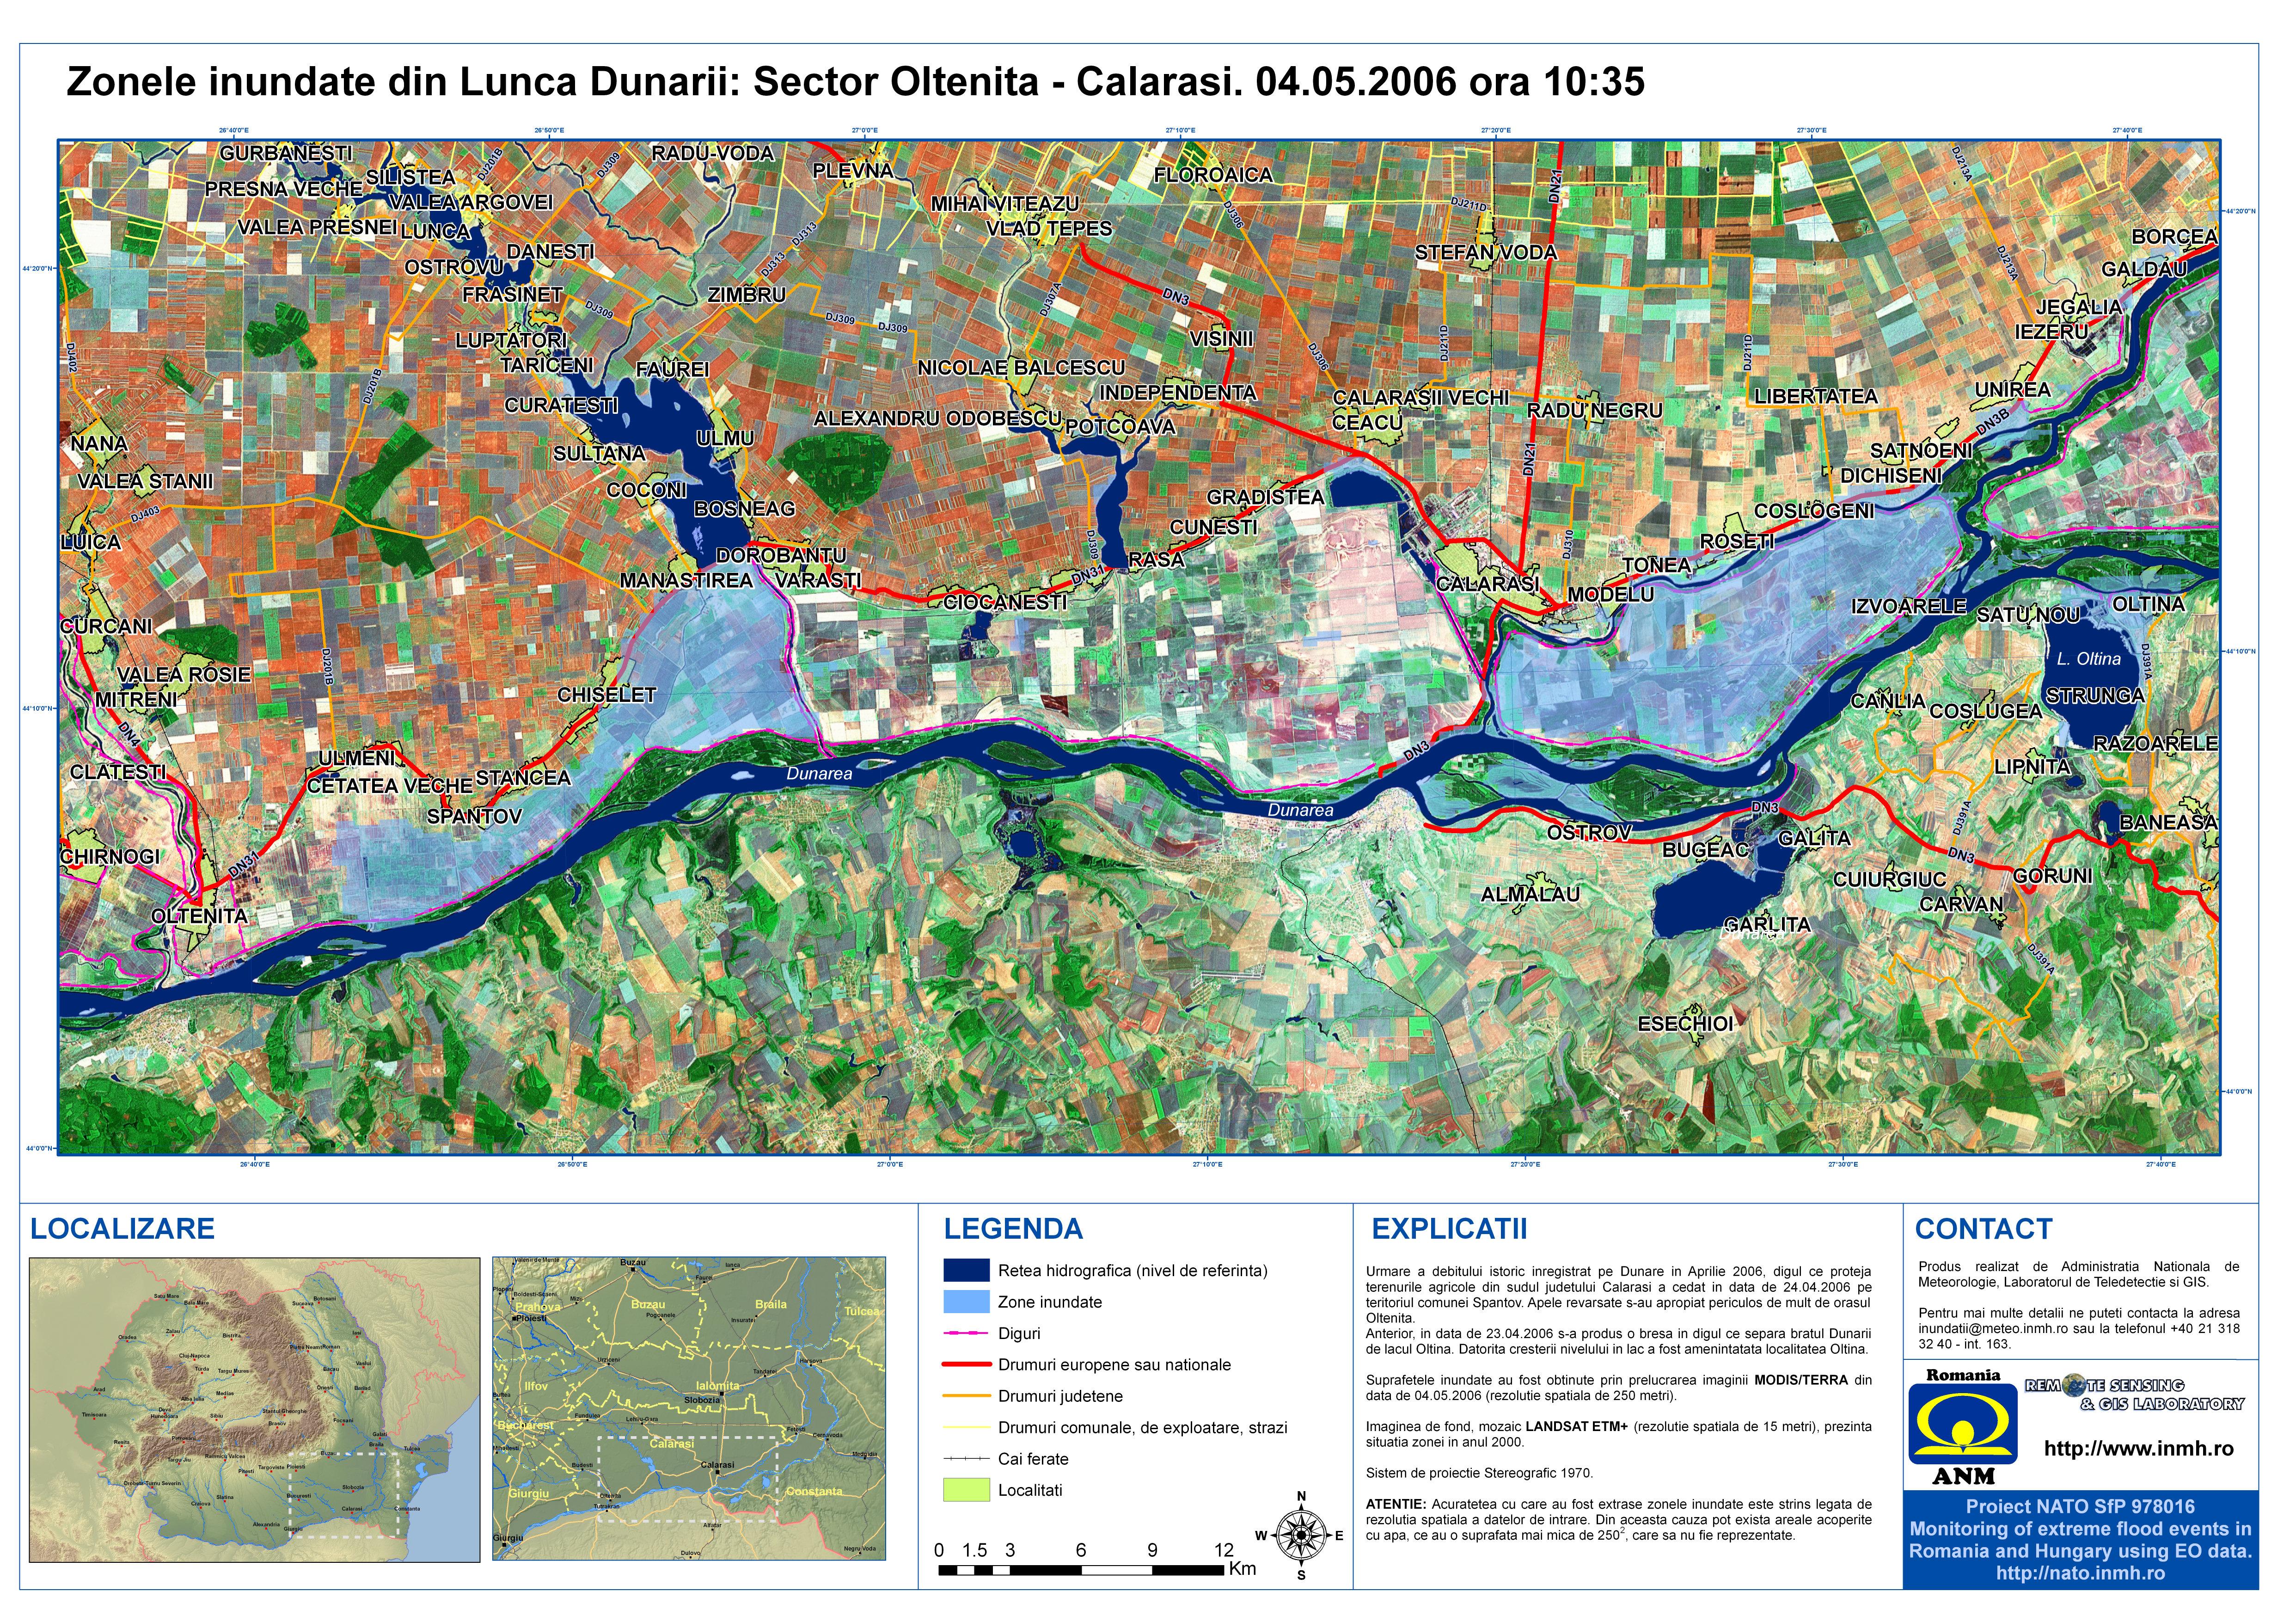 Inundatii Lunca Dunarii 2006